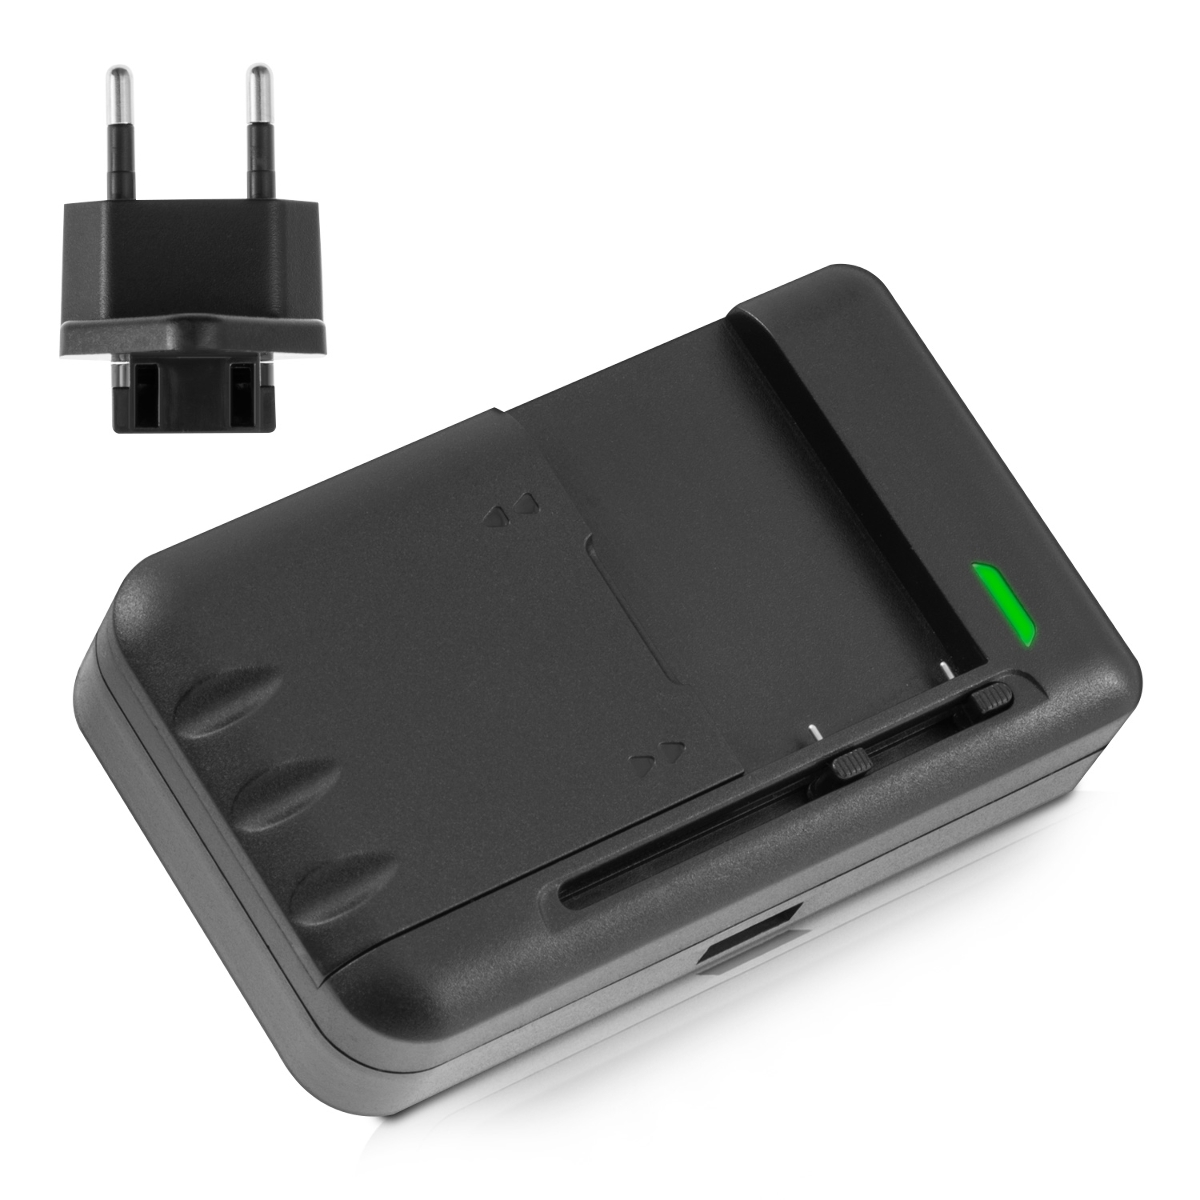 chargeur universel de batterie smartphone samsung nokia motorola htc sony. Black Bedroom Furniture Sets. Home Design Ideas